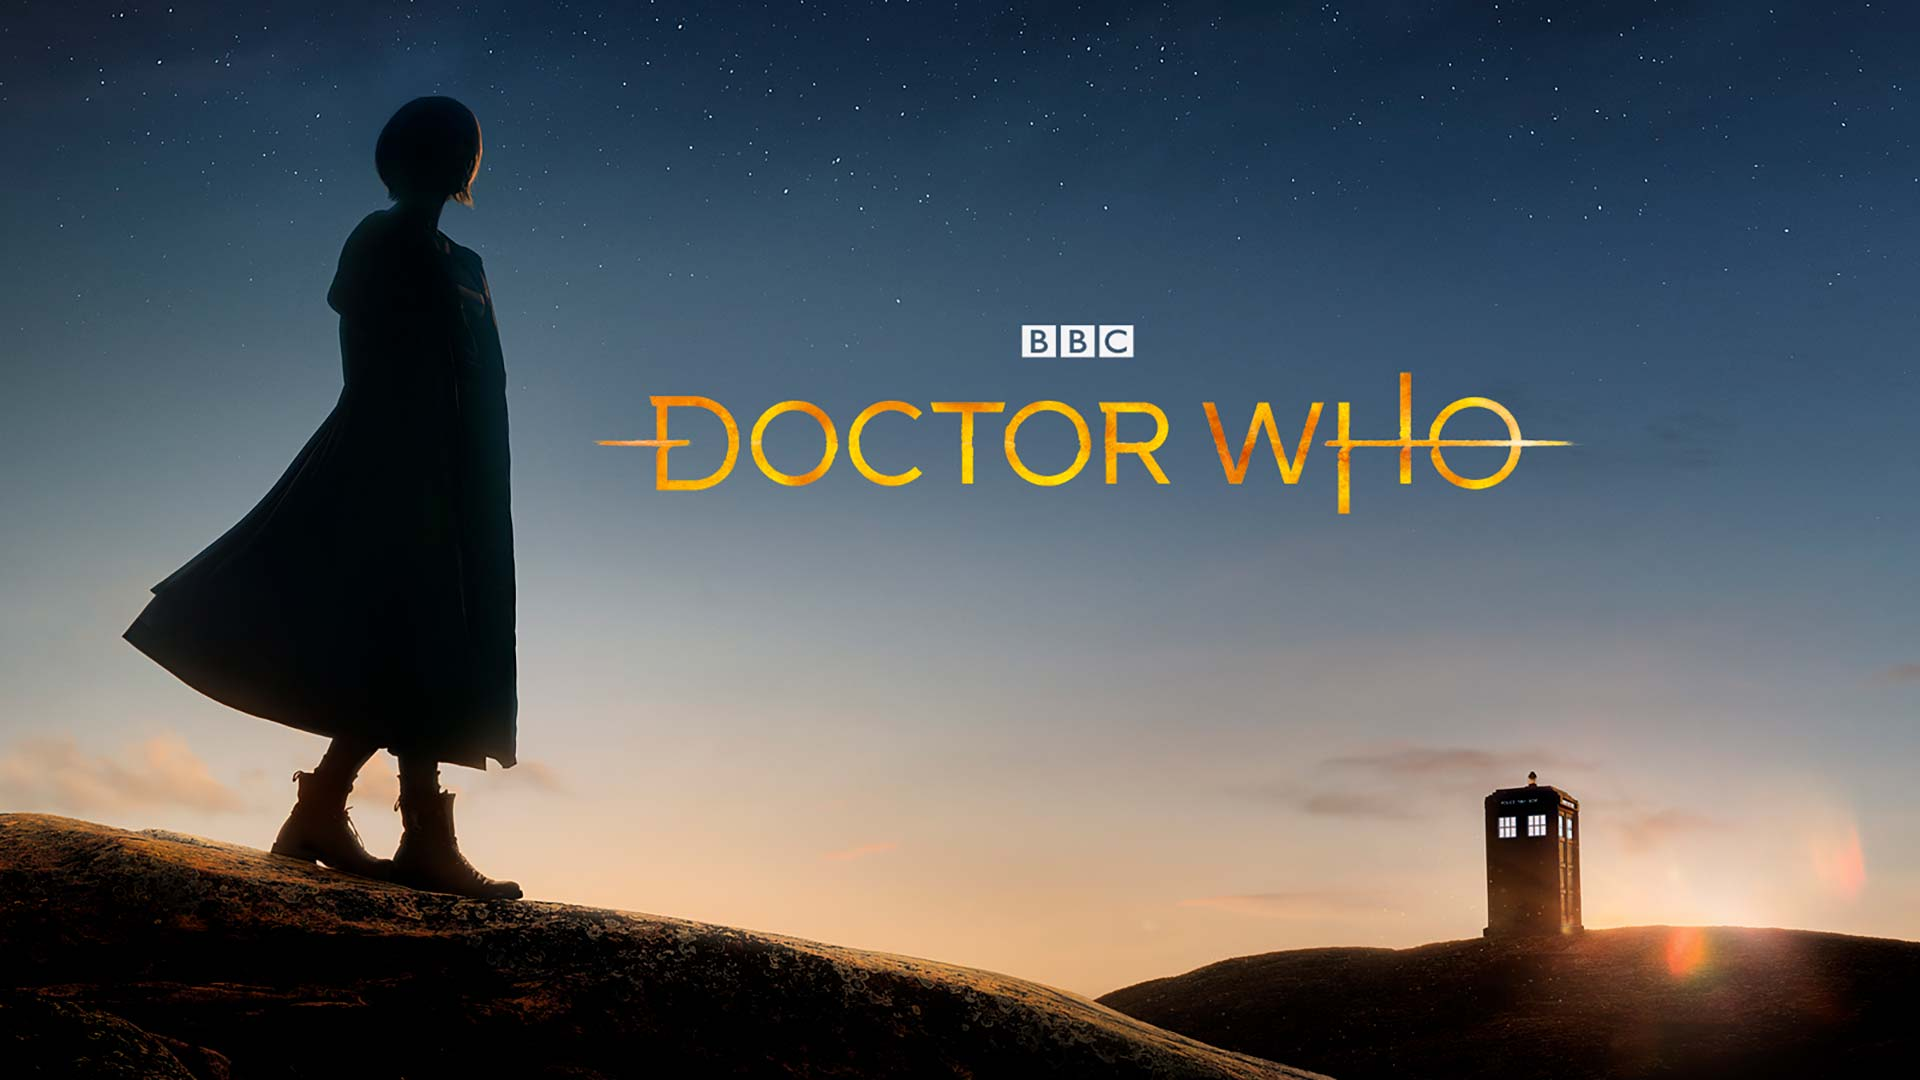 The Fall Bbc Wallpaper Bbc America Reveals New Doctor Who Logo Anglophenia